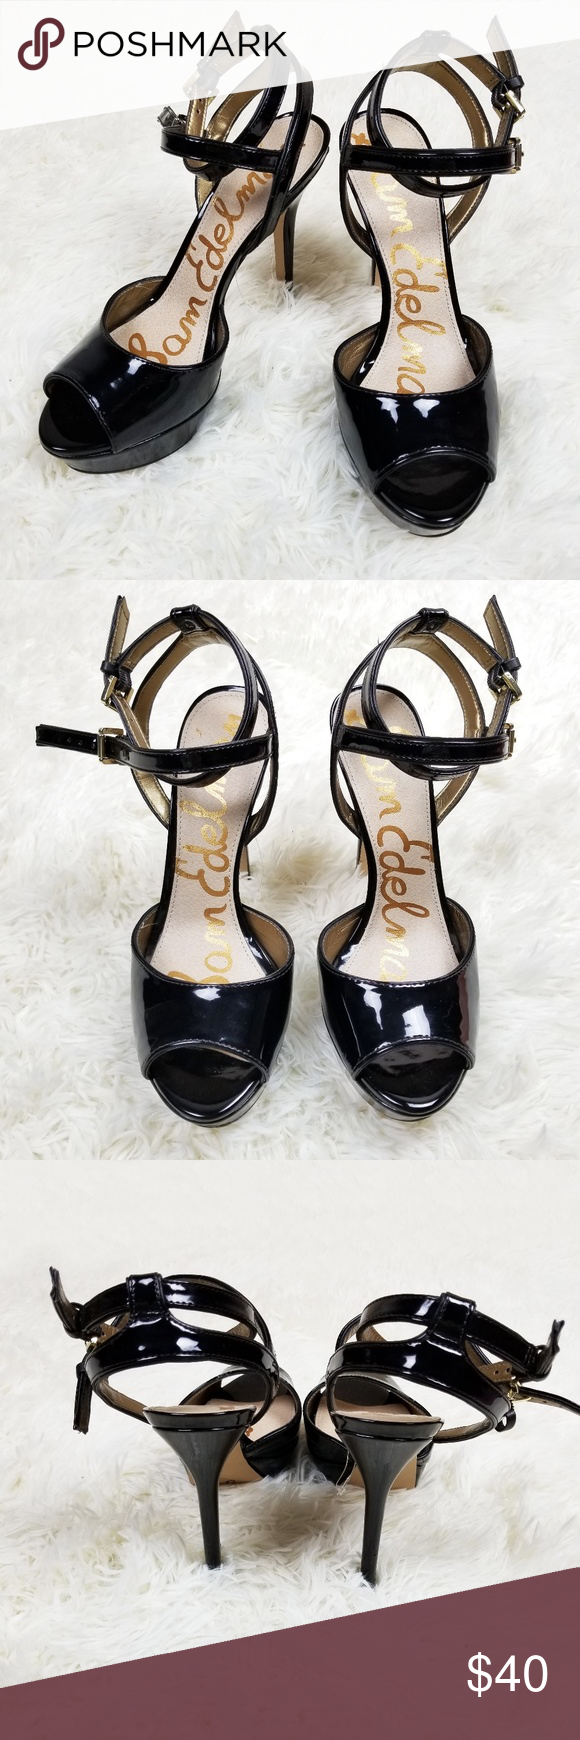 e656effb863 Sam Edelman Black Nadine Patent Leather Pumps Sz 8 Sam Edelman Nadine style  platform stiletto heels